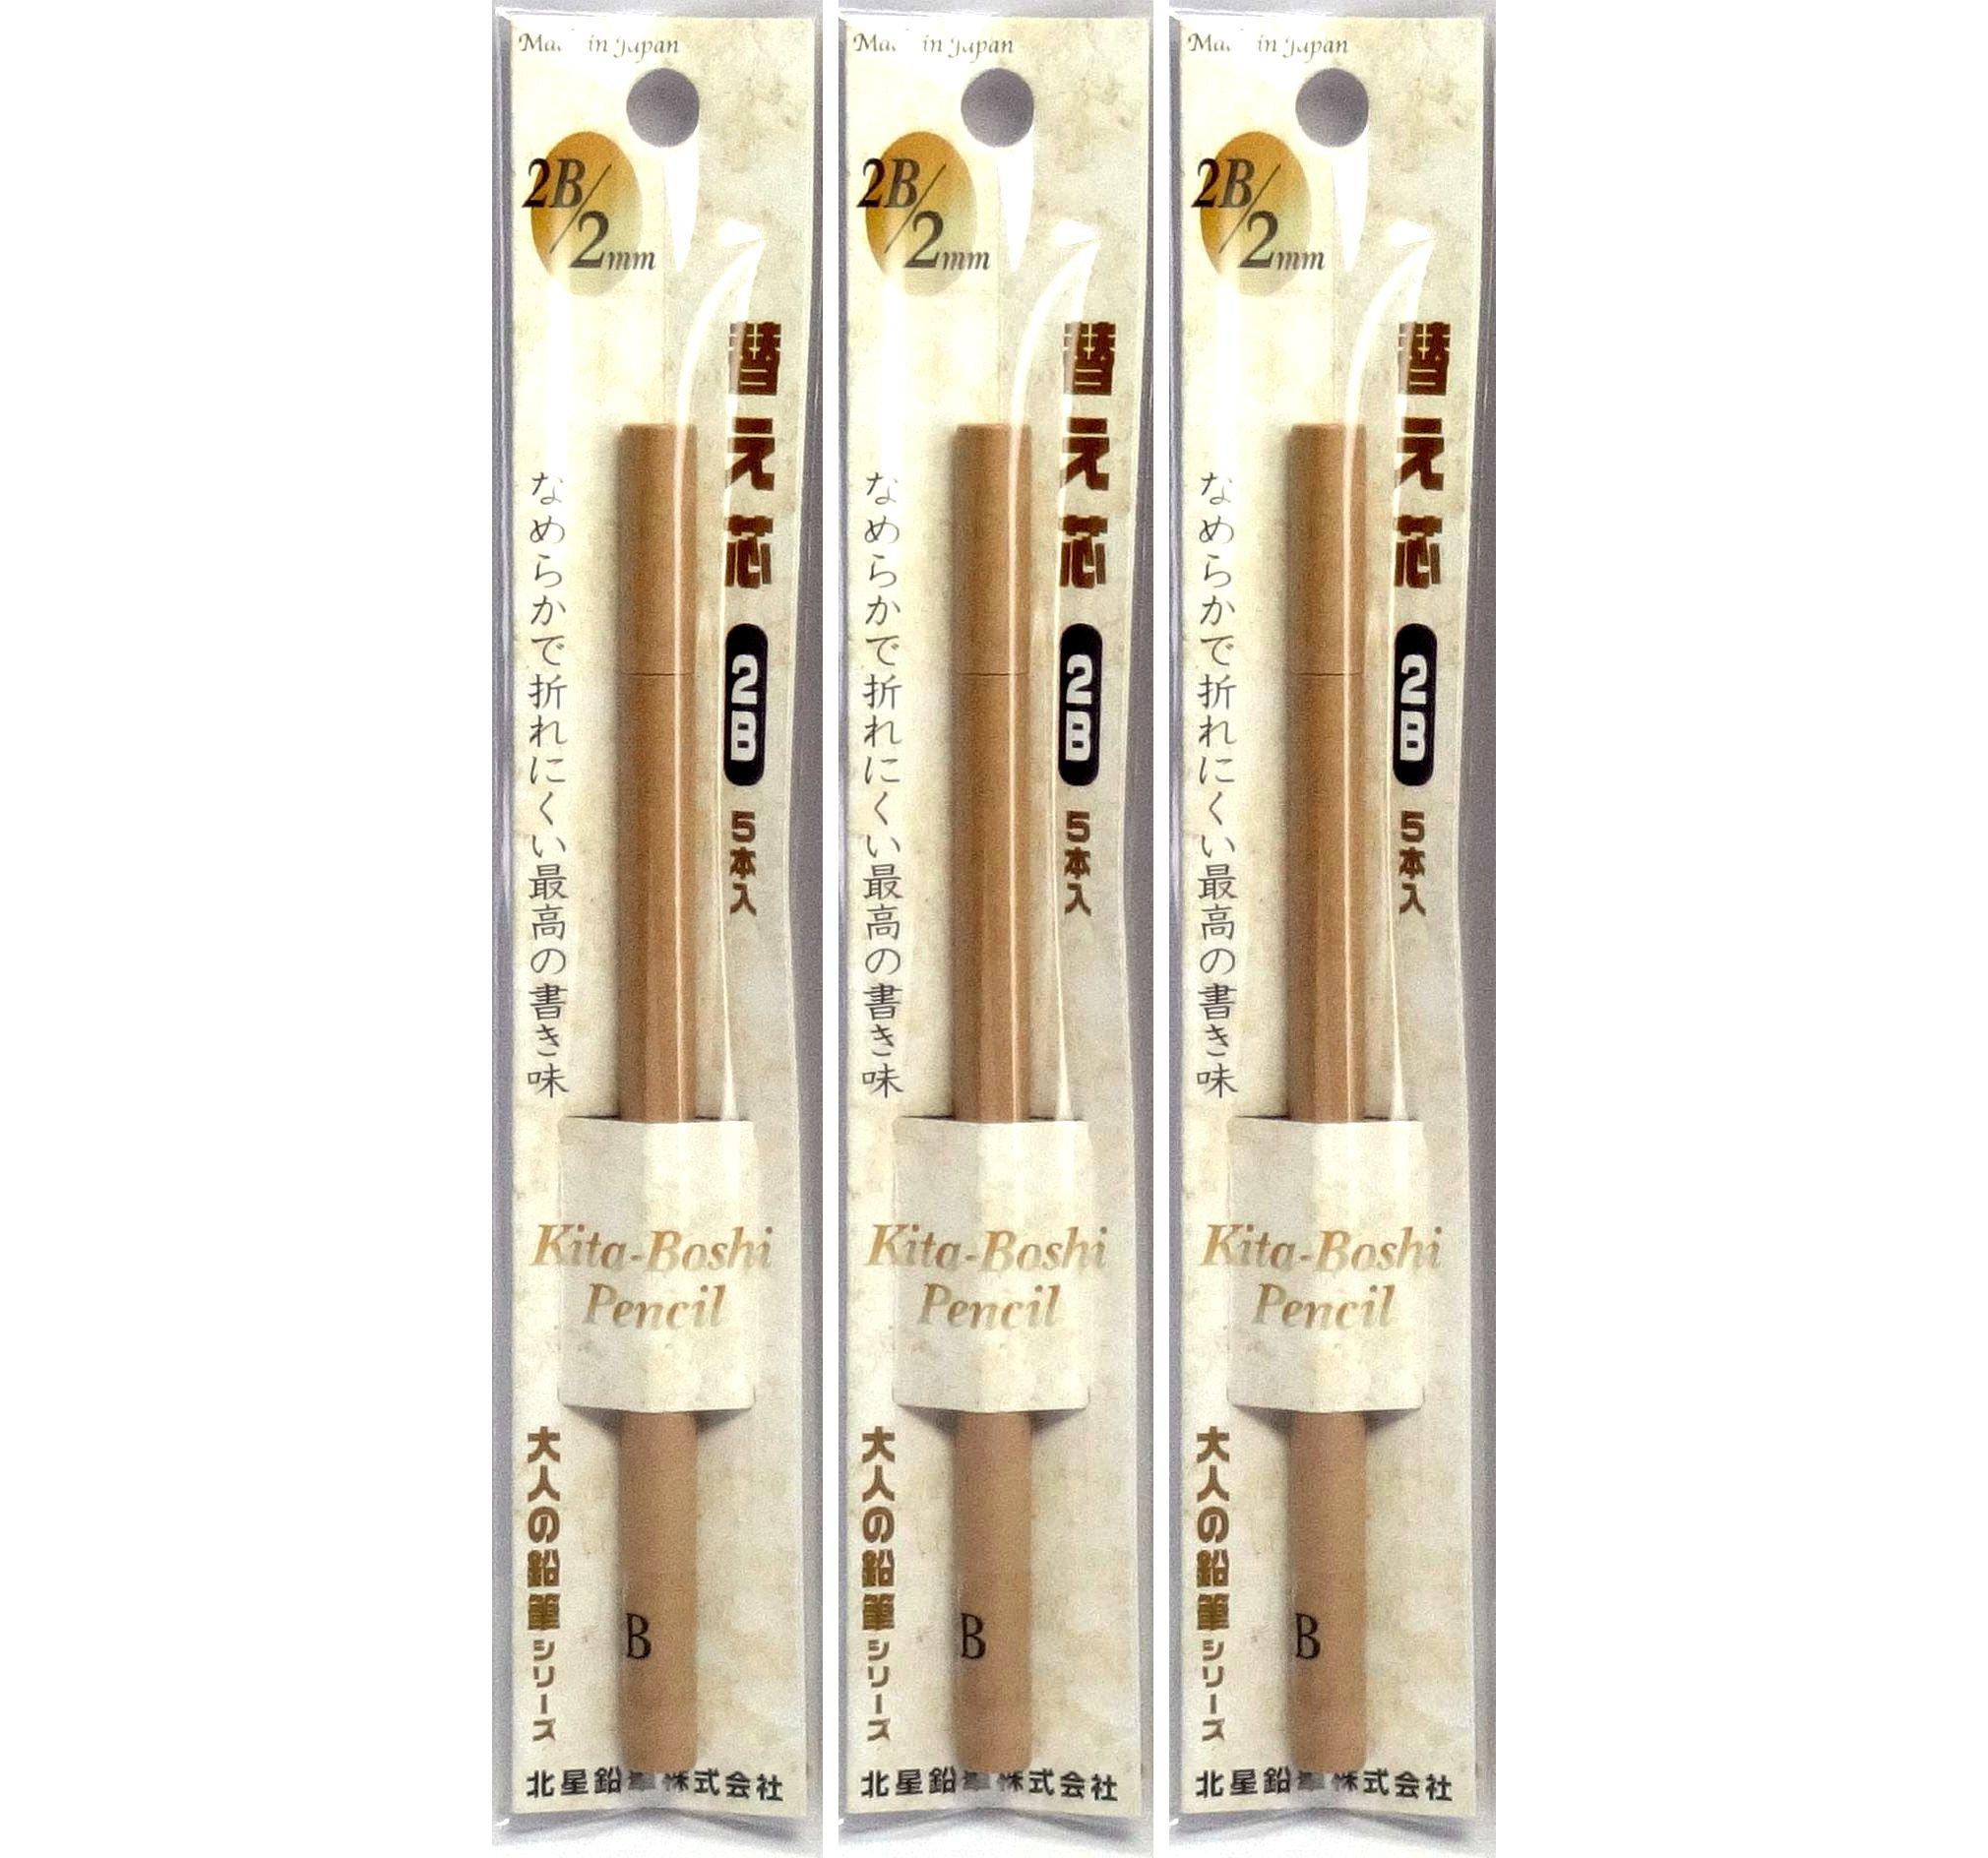 Kitaboshi Holder Refill, 2mm 2B, 5 Leads (OTP-1502B)×3 Pack/total 15 Leads (Japan Import) [Komainu-Dou Original Package]